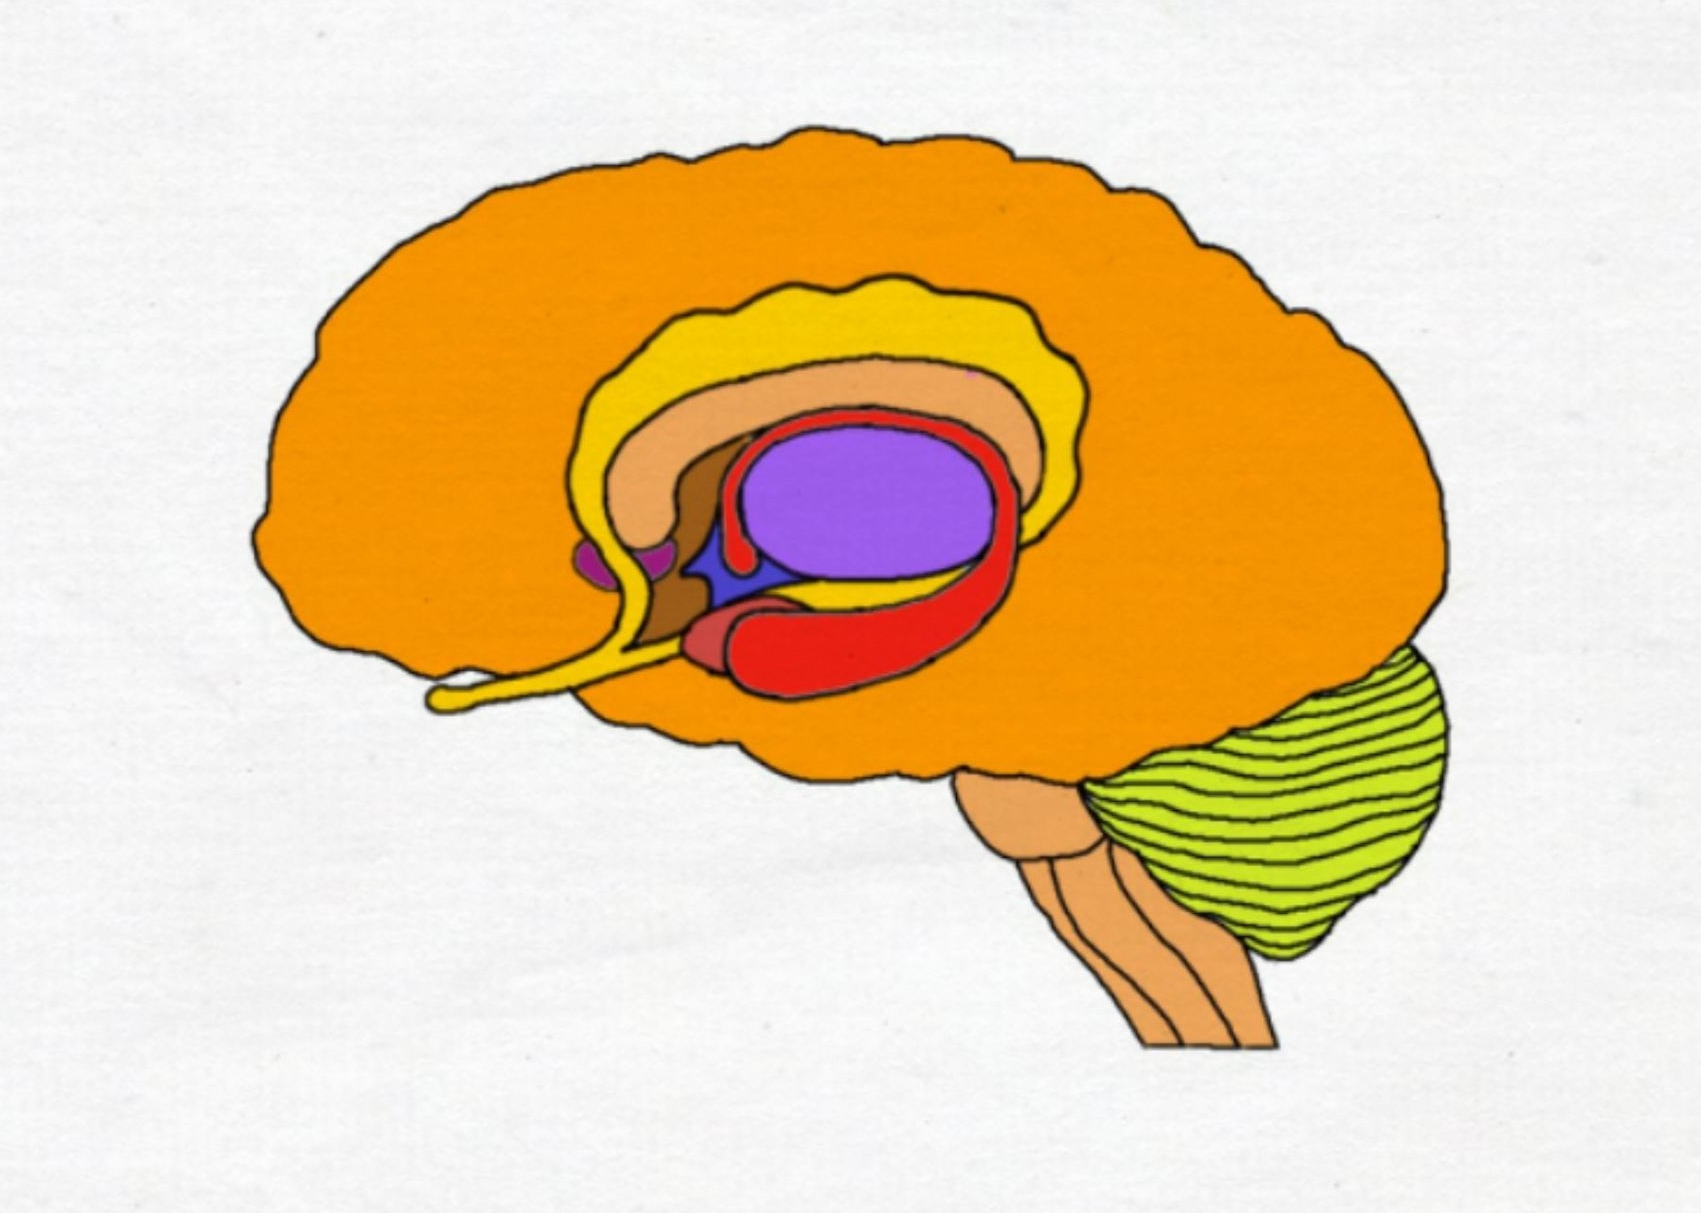 "2-Minute Neuroscience<a href=""/blog/2-minute-neuroscience-limbic-system"">→</a><strong>Limbic System</strong>"